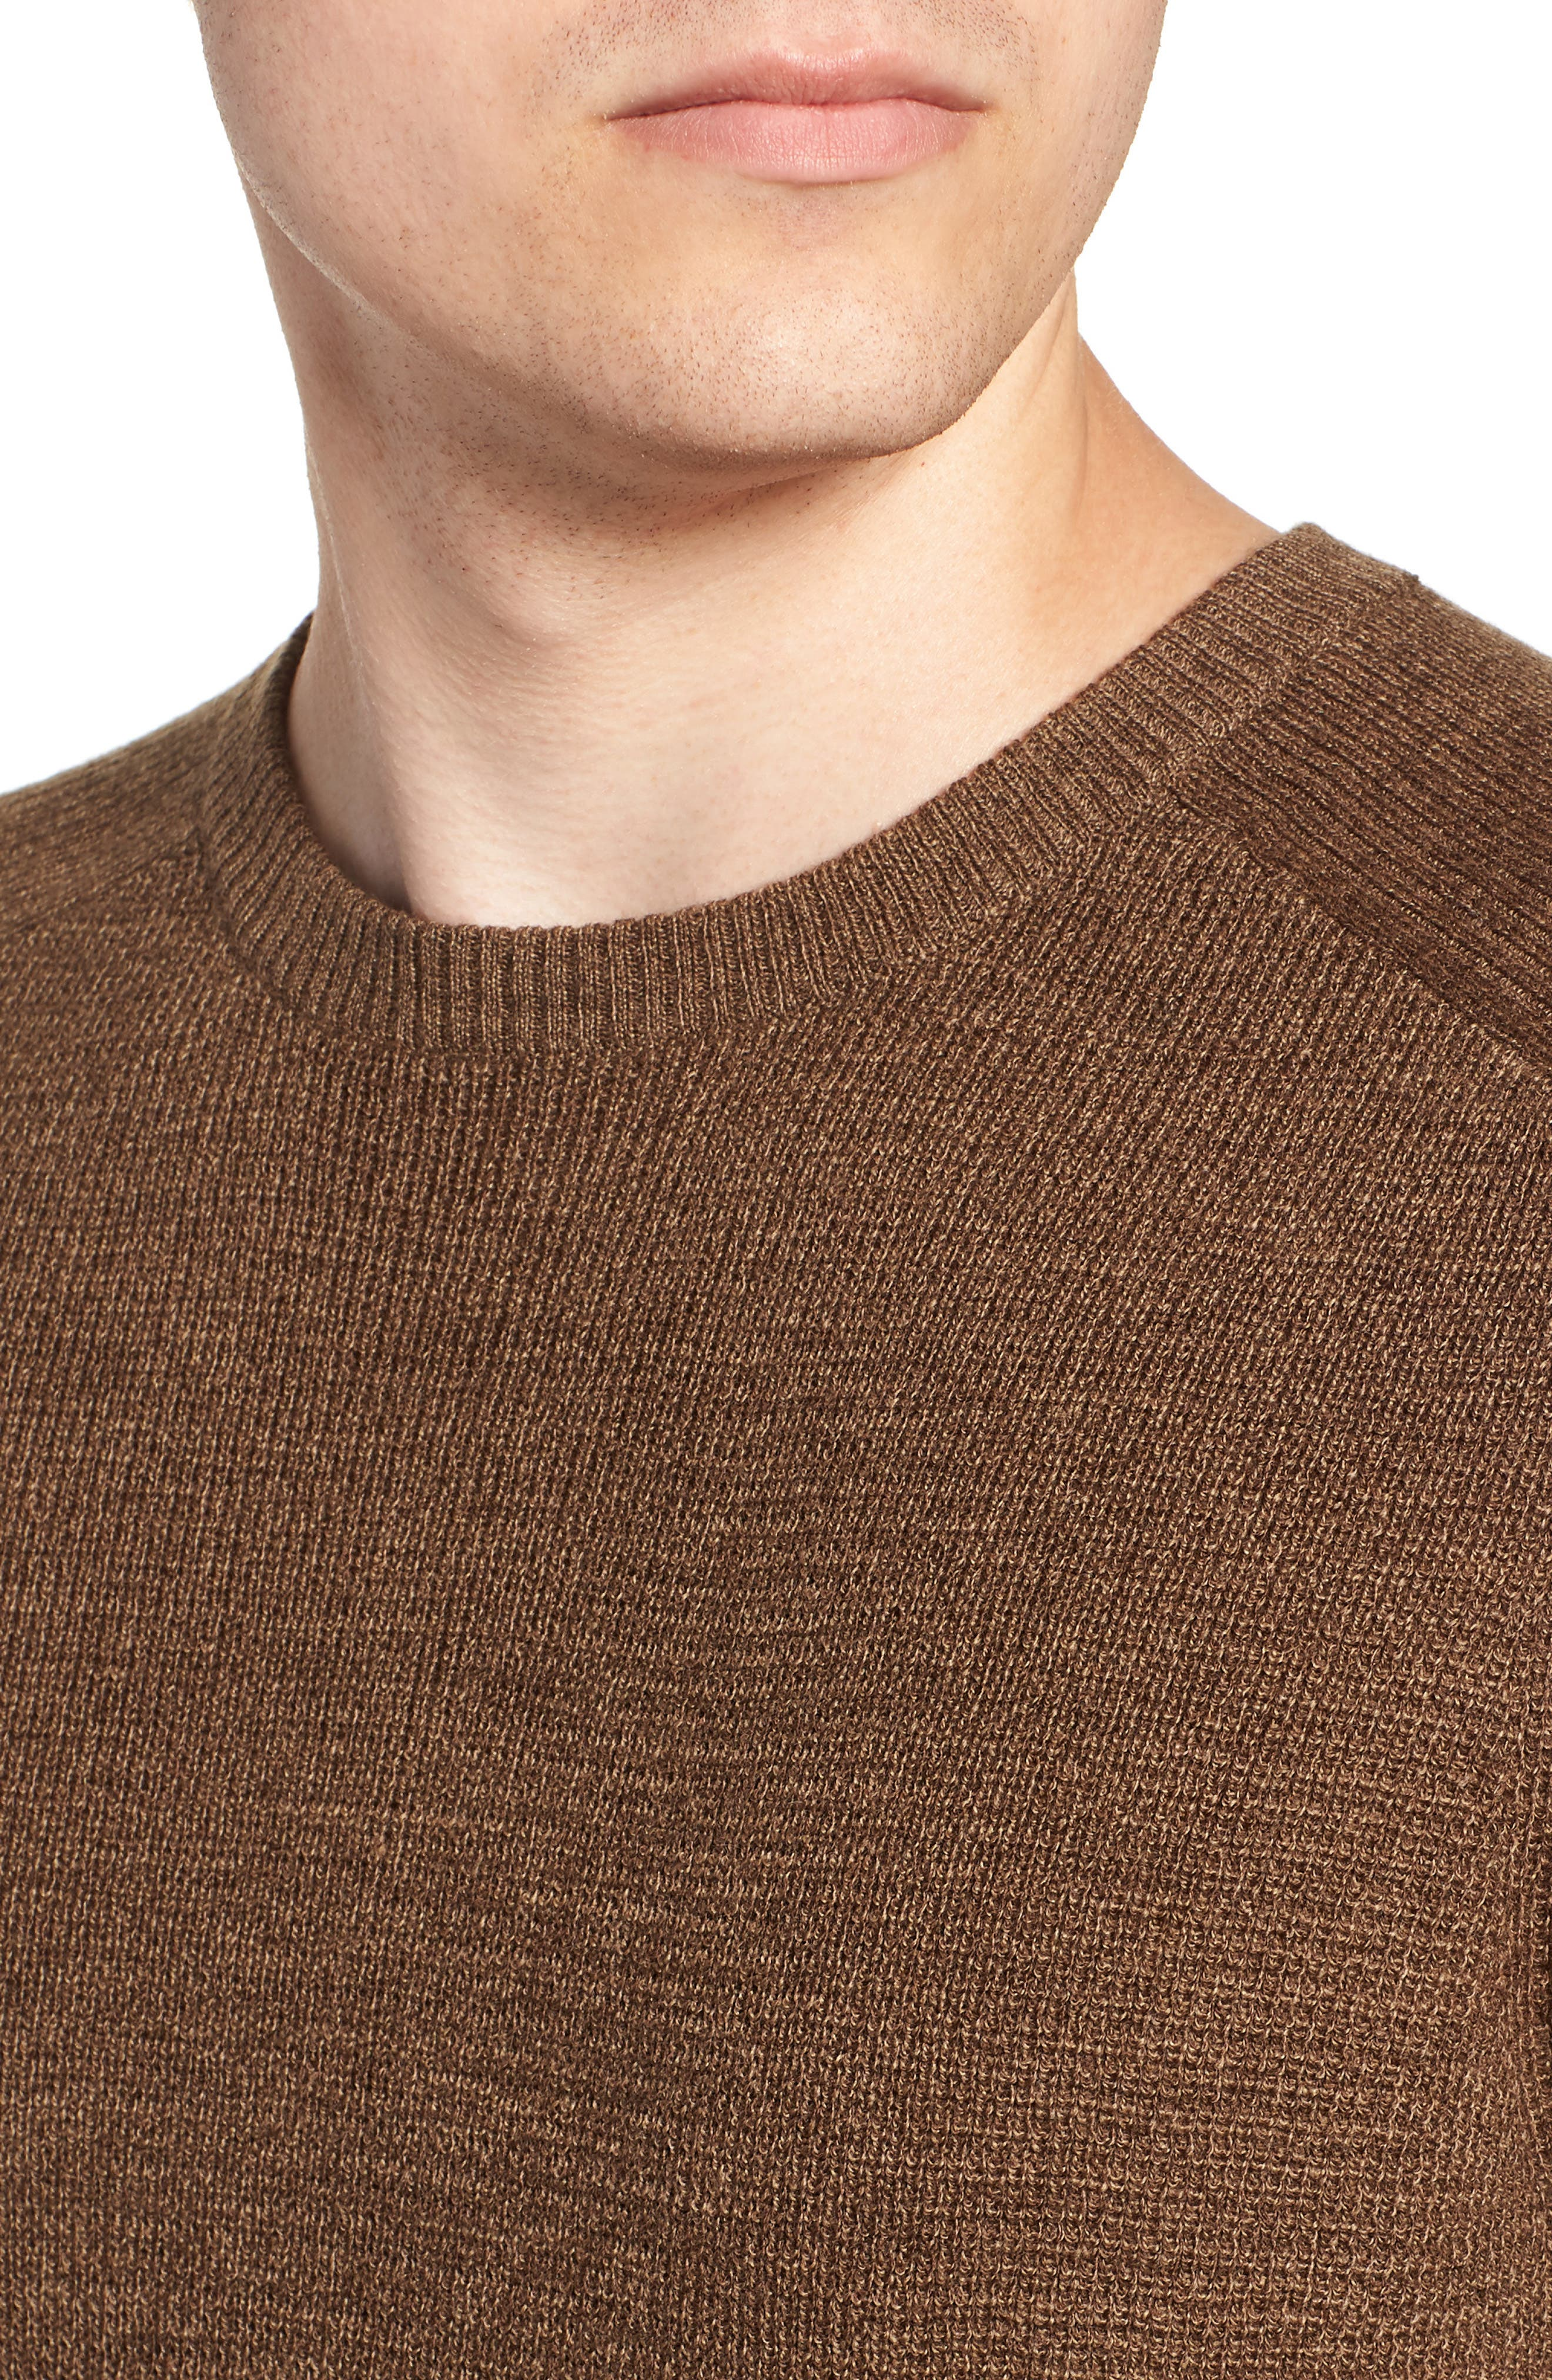 Crewneck Wool Blend Sweater,                             Alternate thumbnail 4, color,                             BROWN MAJOR